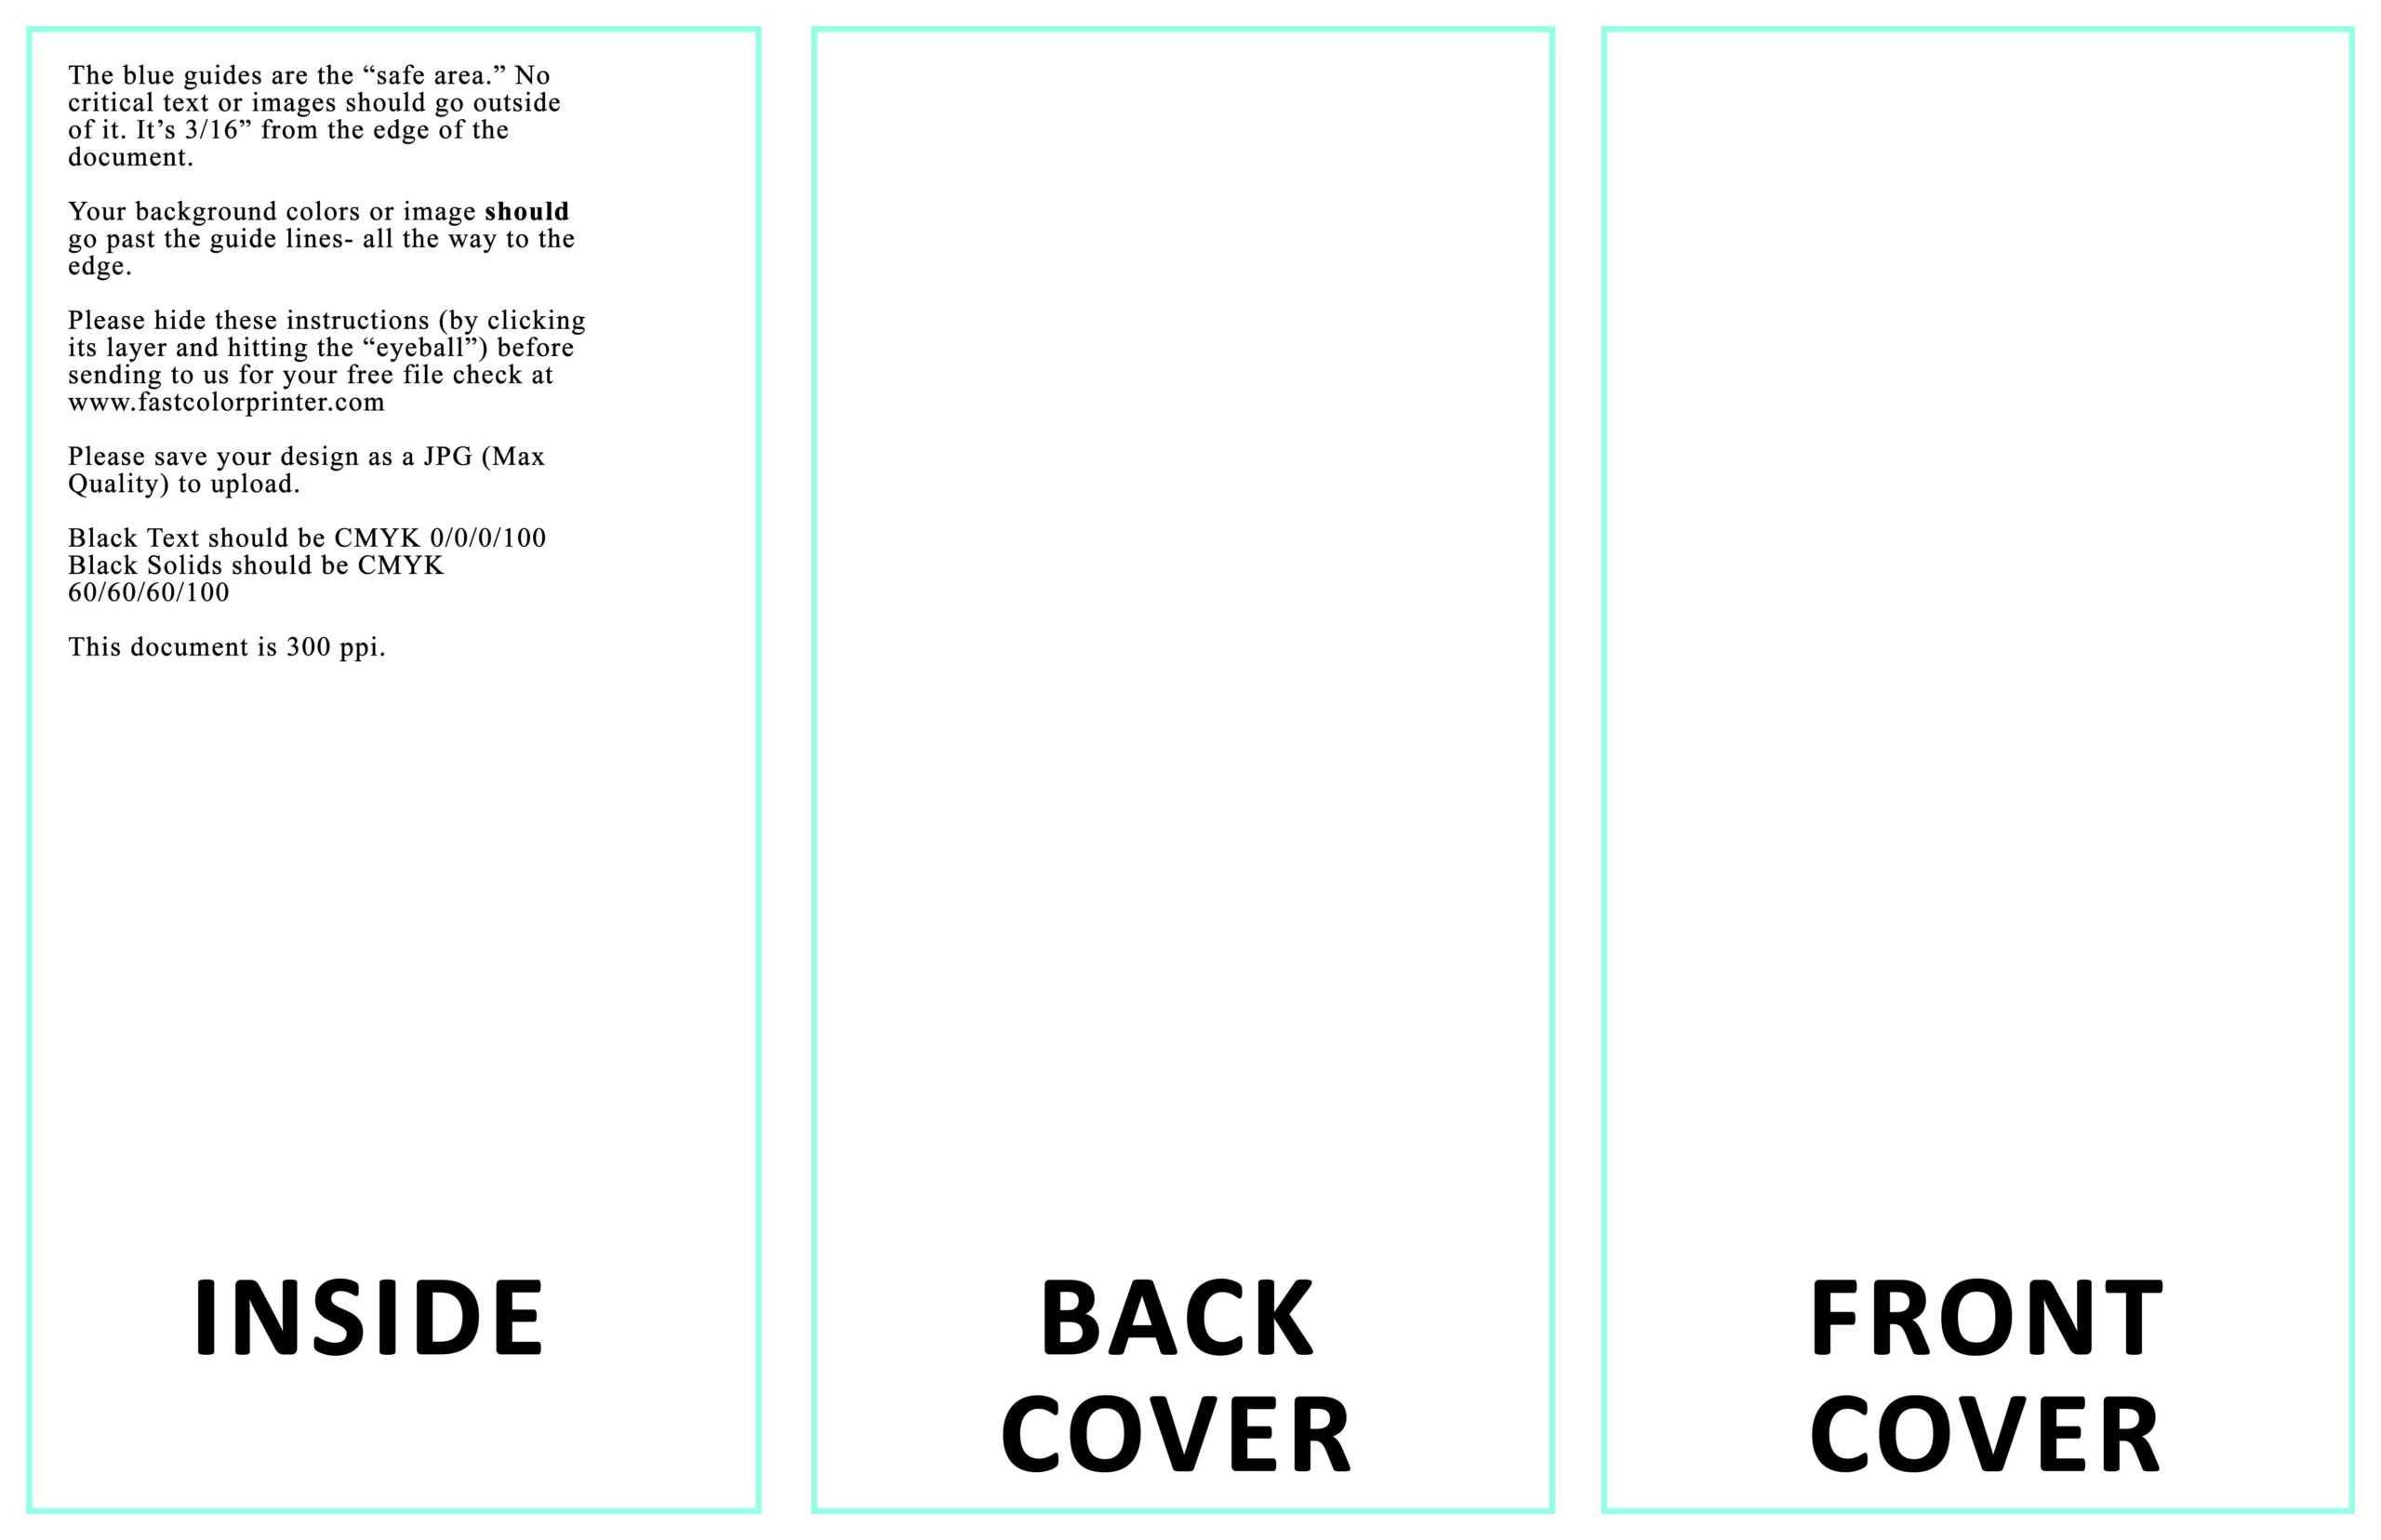 007 Tri Fold Brochure Template Google Docs Free Ideas Pertaining To Brochure Templates For Google Docs